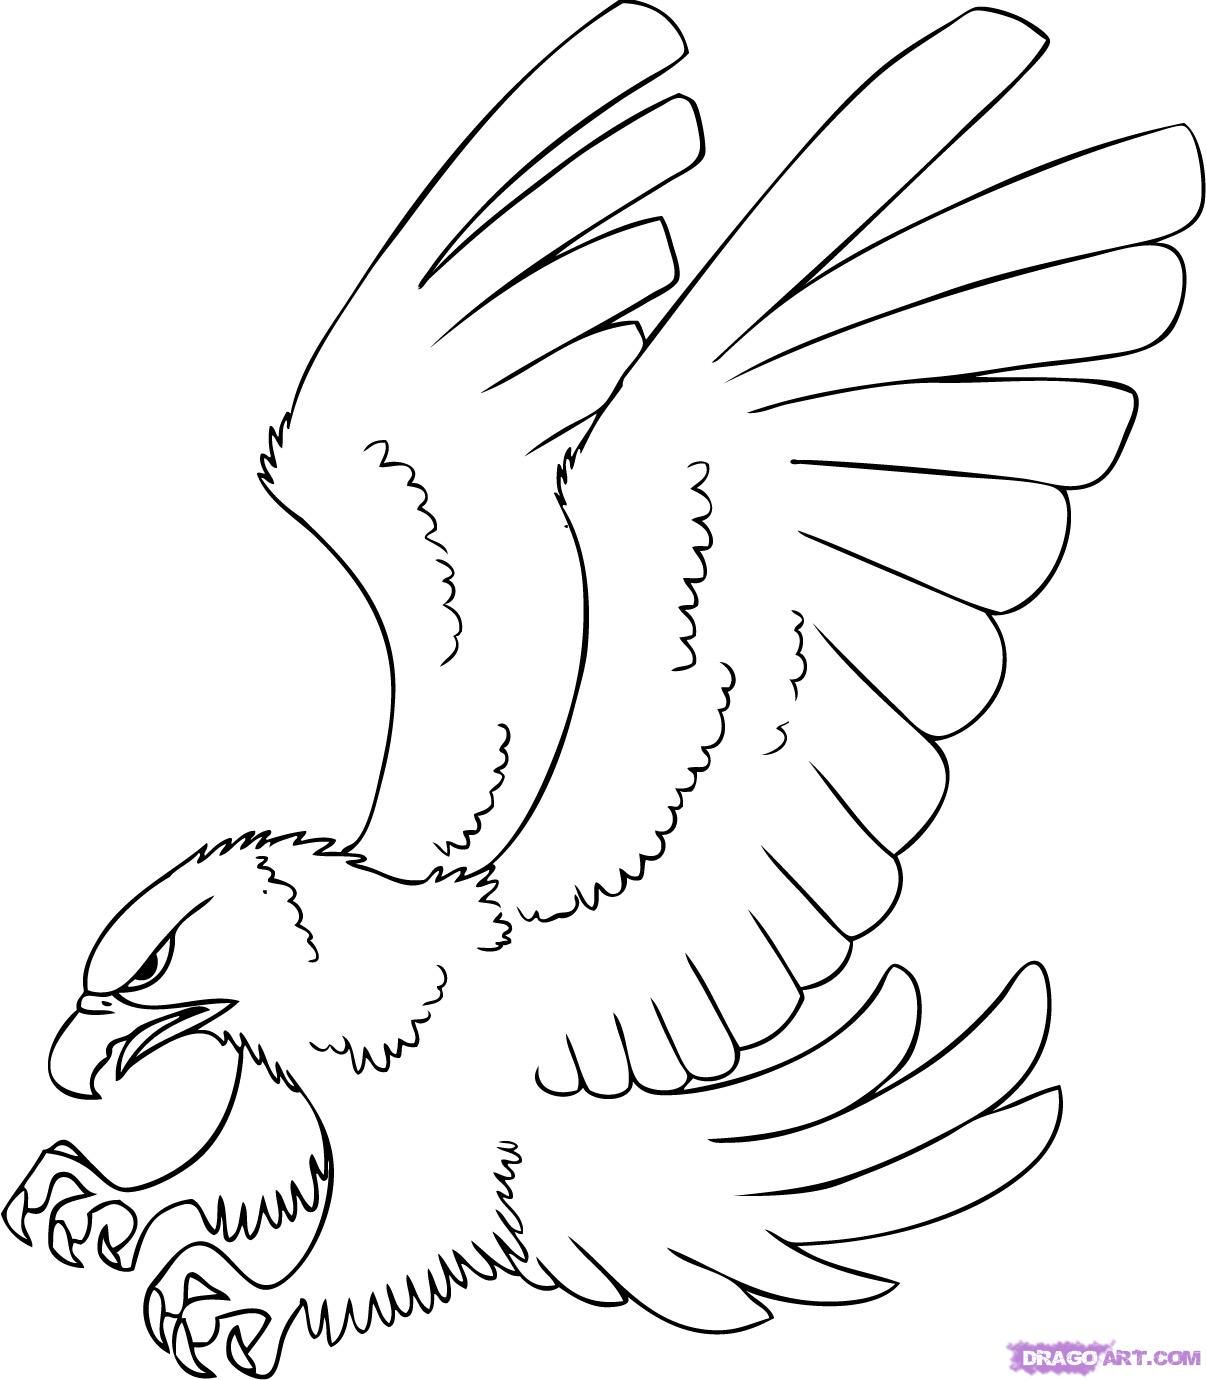 1206x1380 Free Hawk Images To Draw A Cartoon Hawk, Step By Step, Cartoon